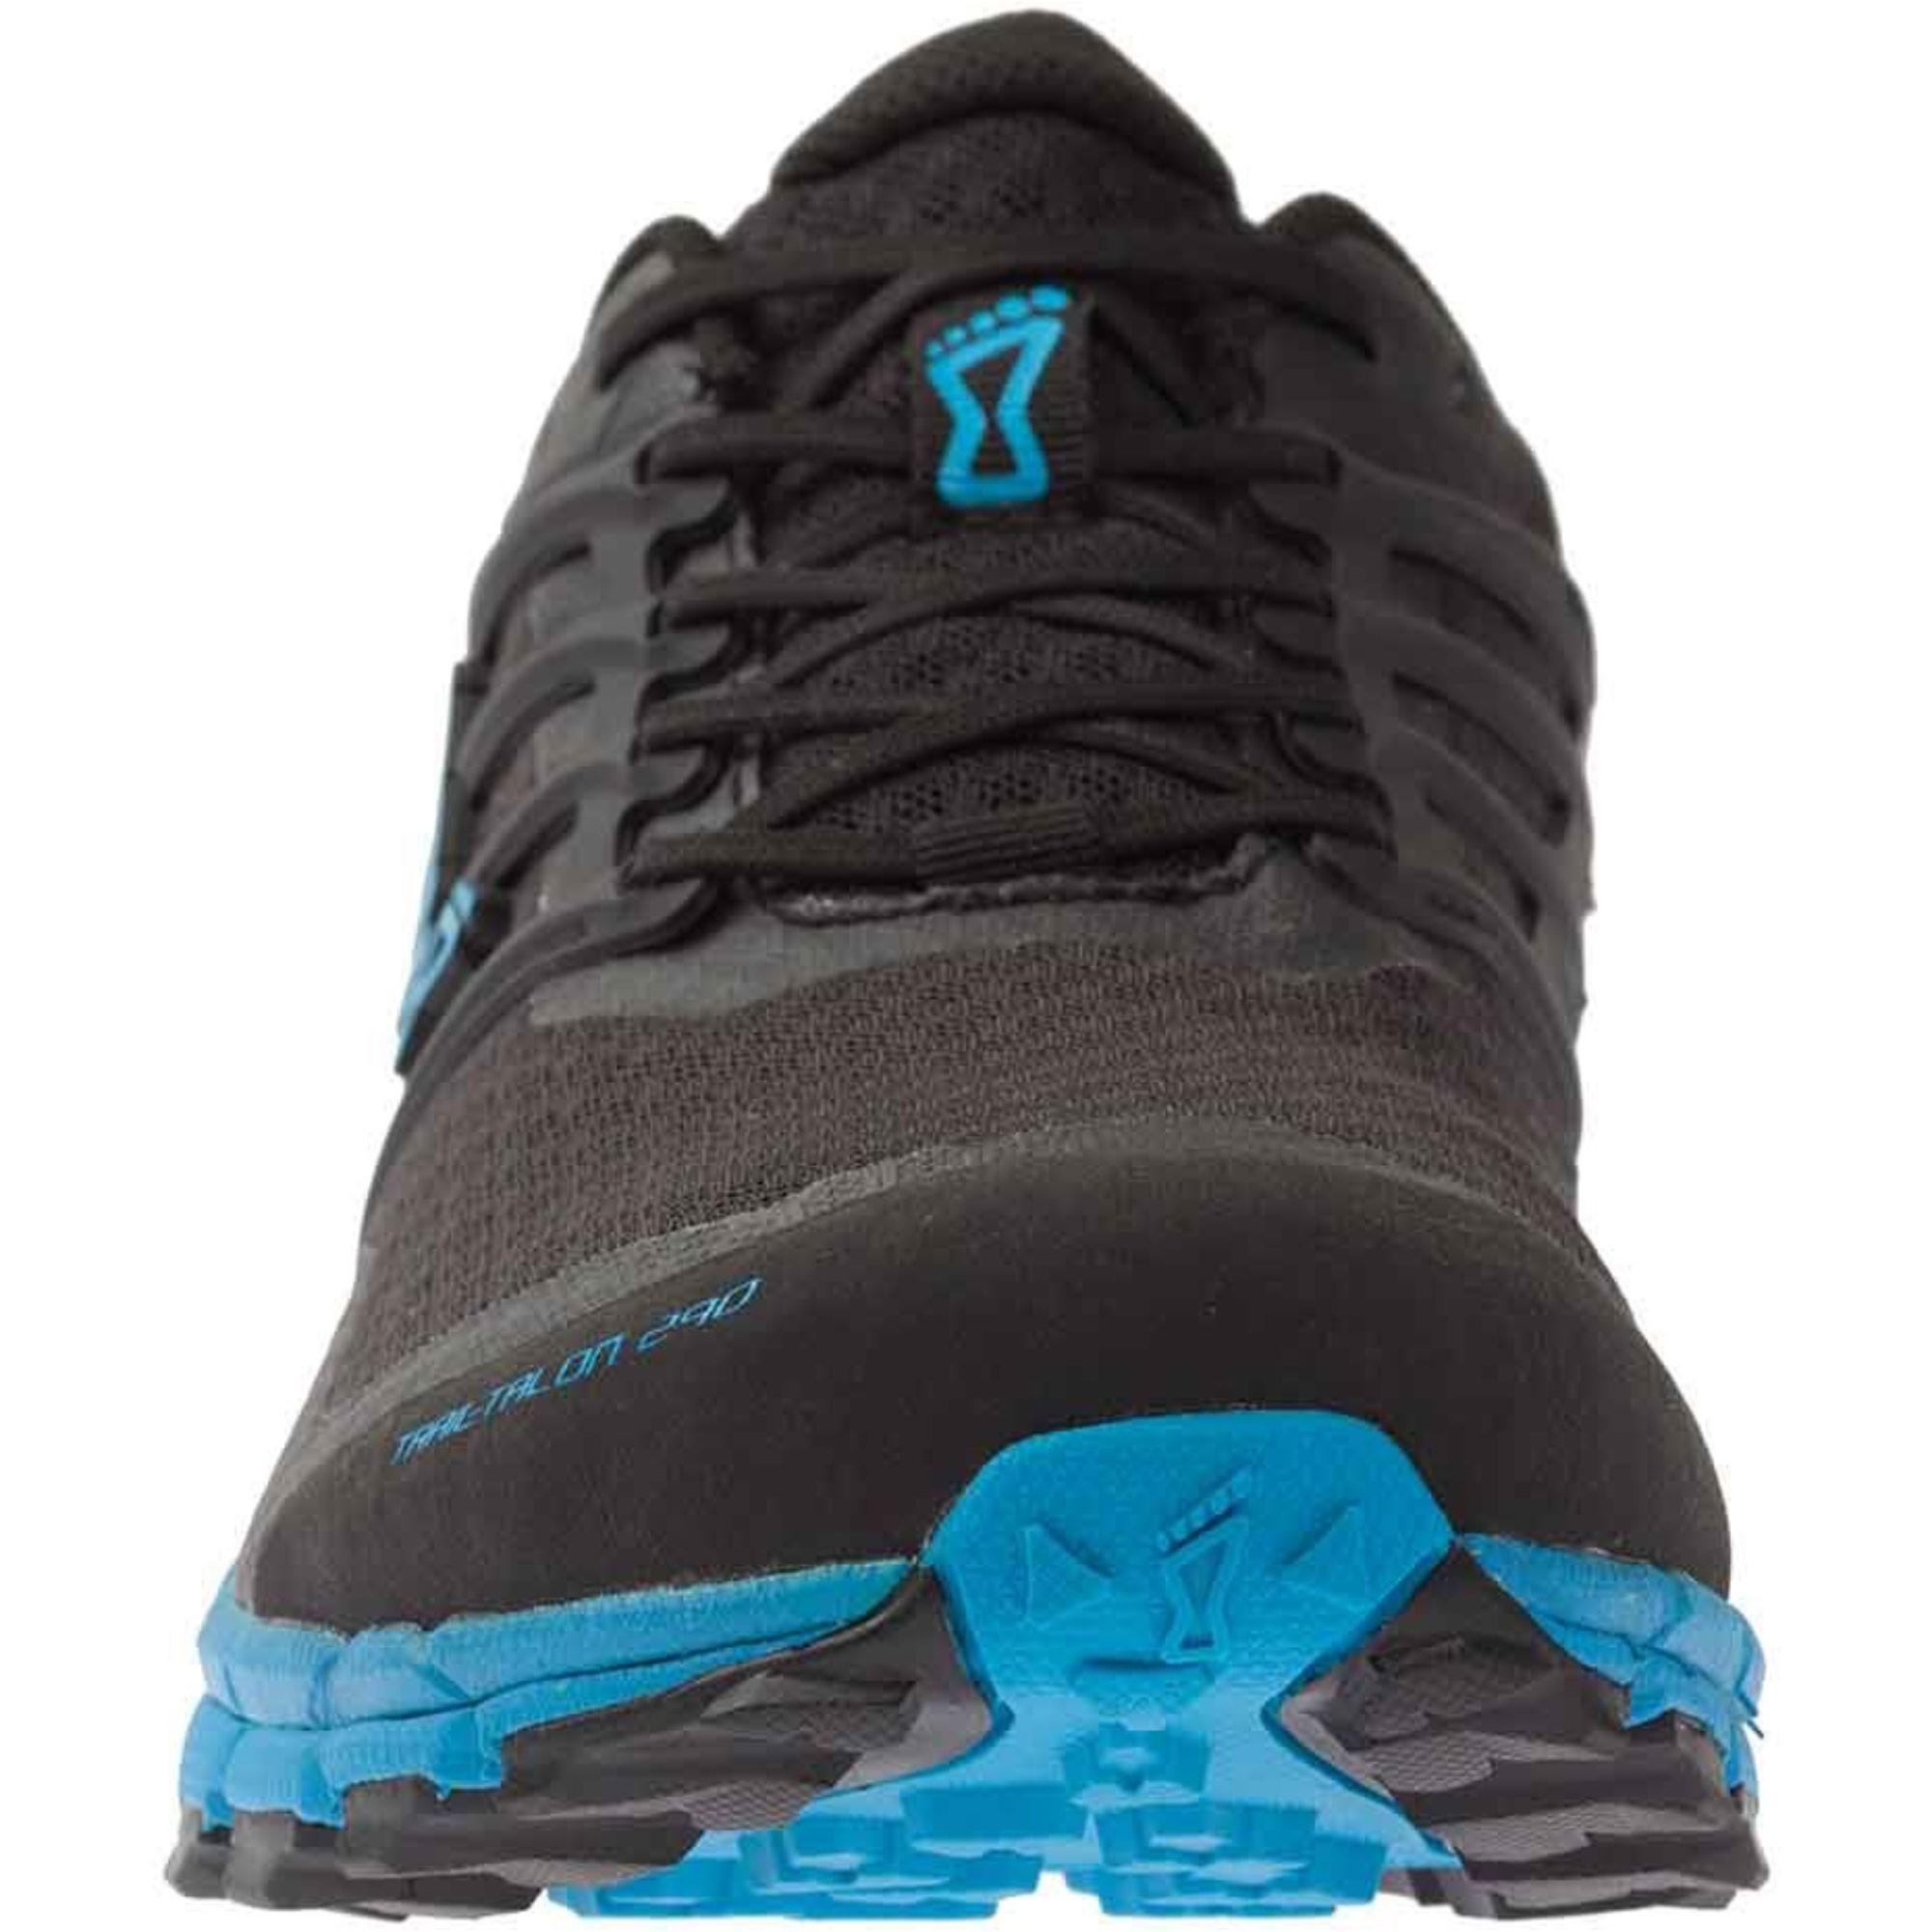 Inov8 Trail Talon 290 Trail Running Shoes - Black/Blue - Toe